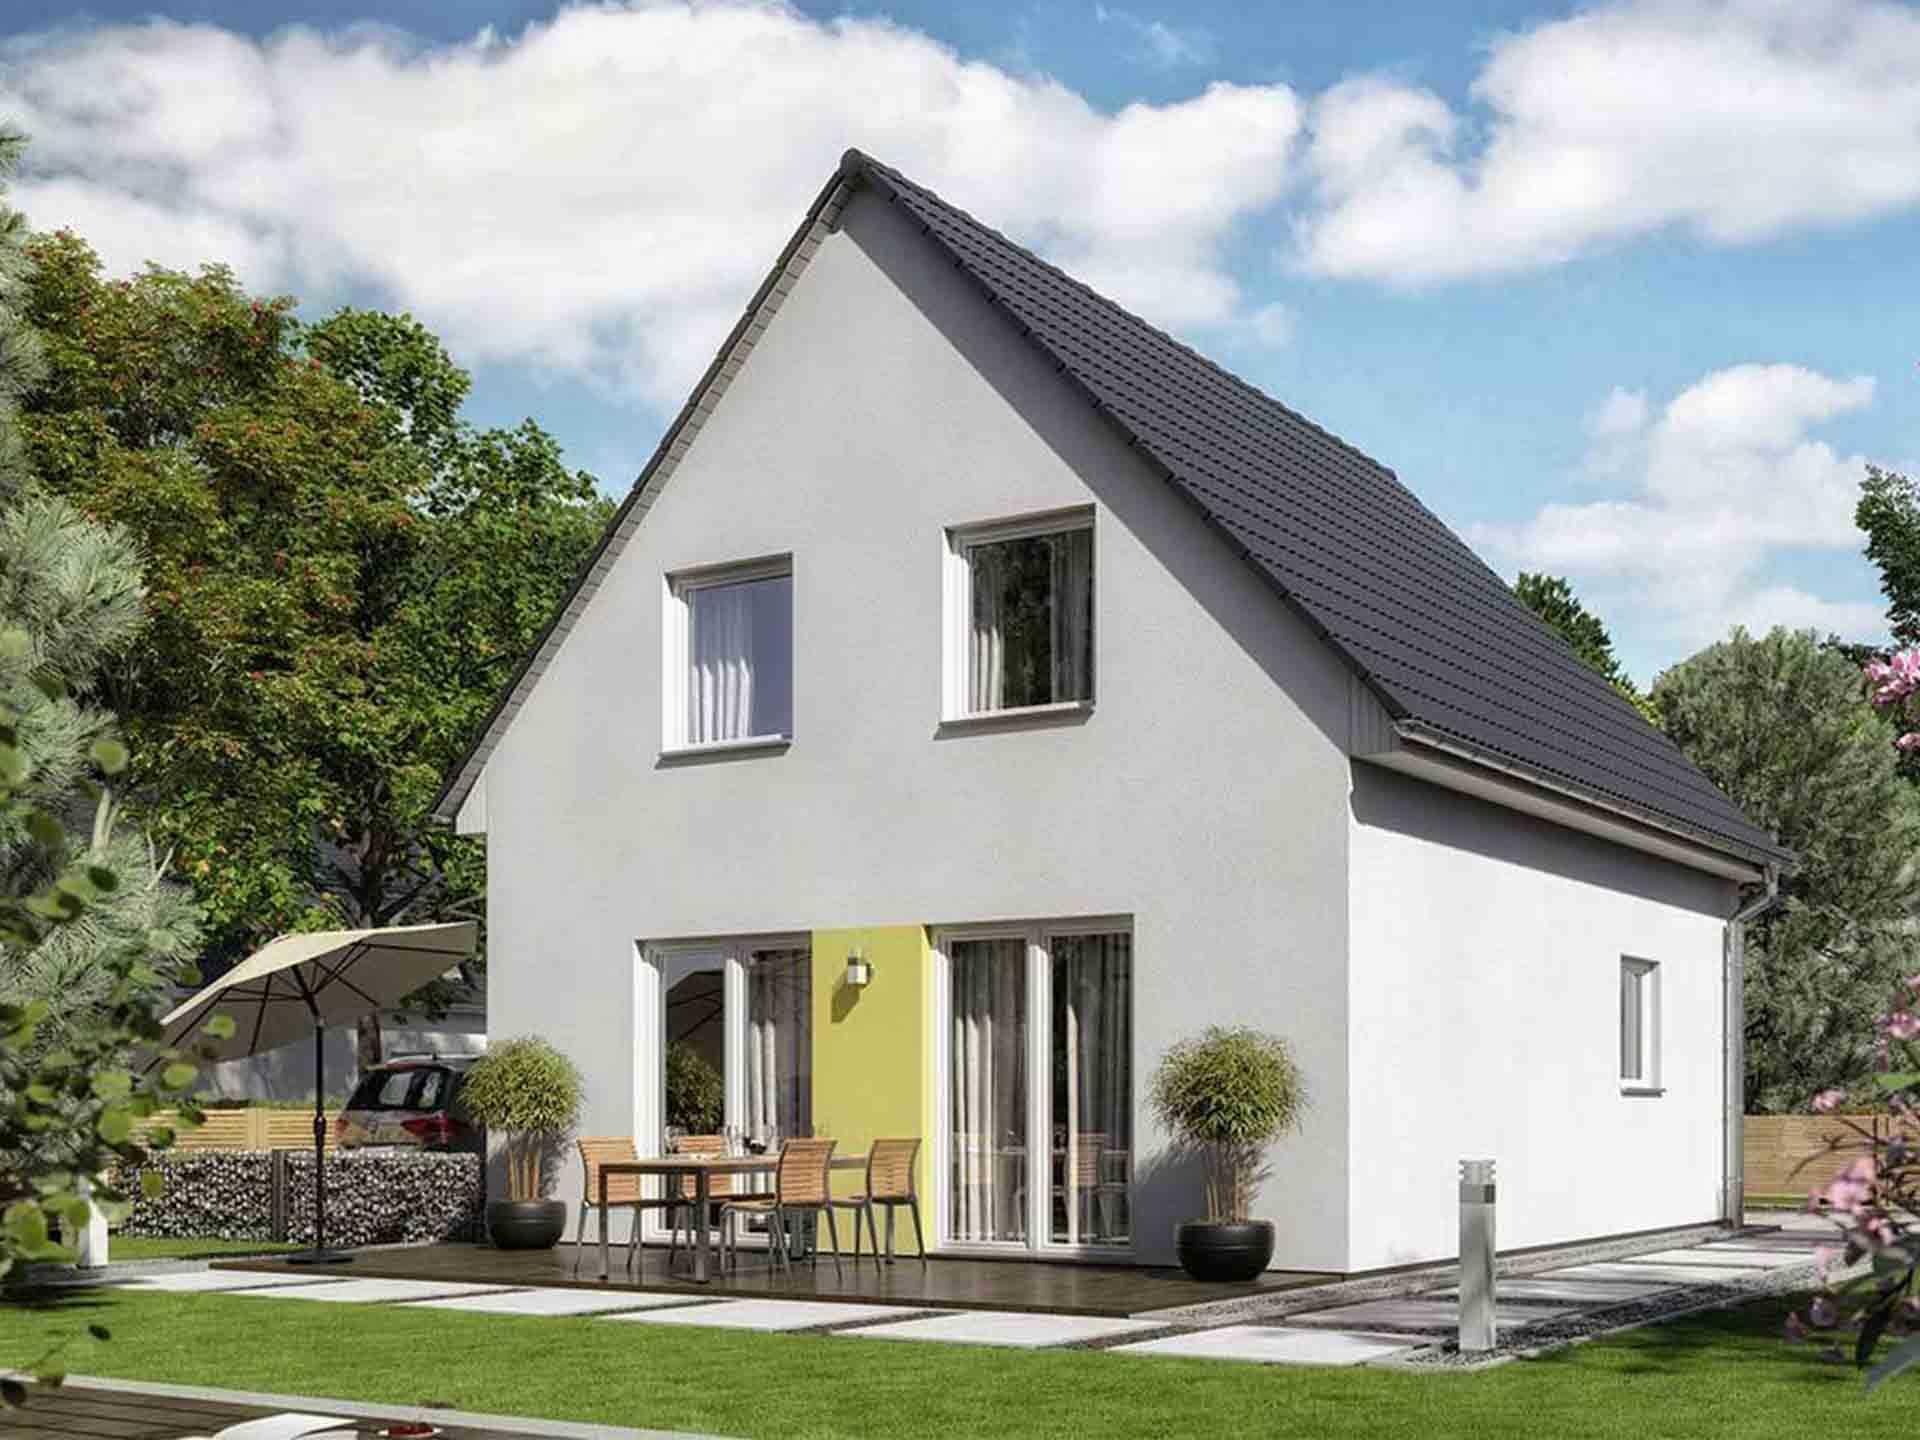 HausBauManufaktur Bau - Town & Country - Einfamilienhaus Raumwunder 90